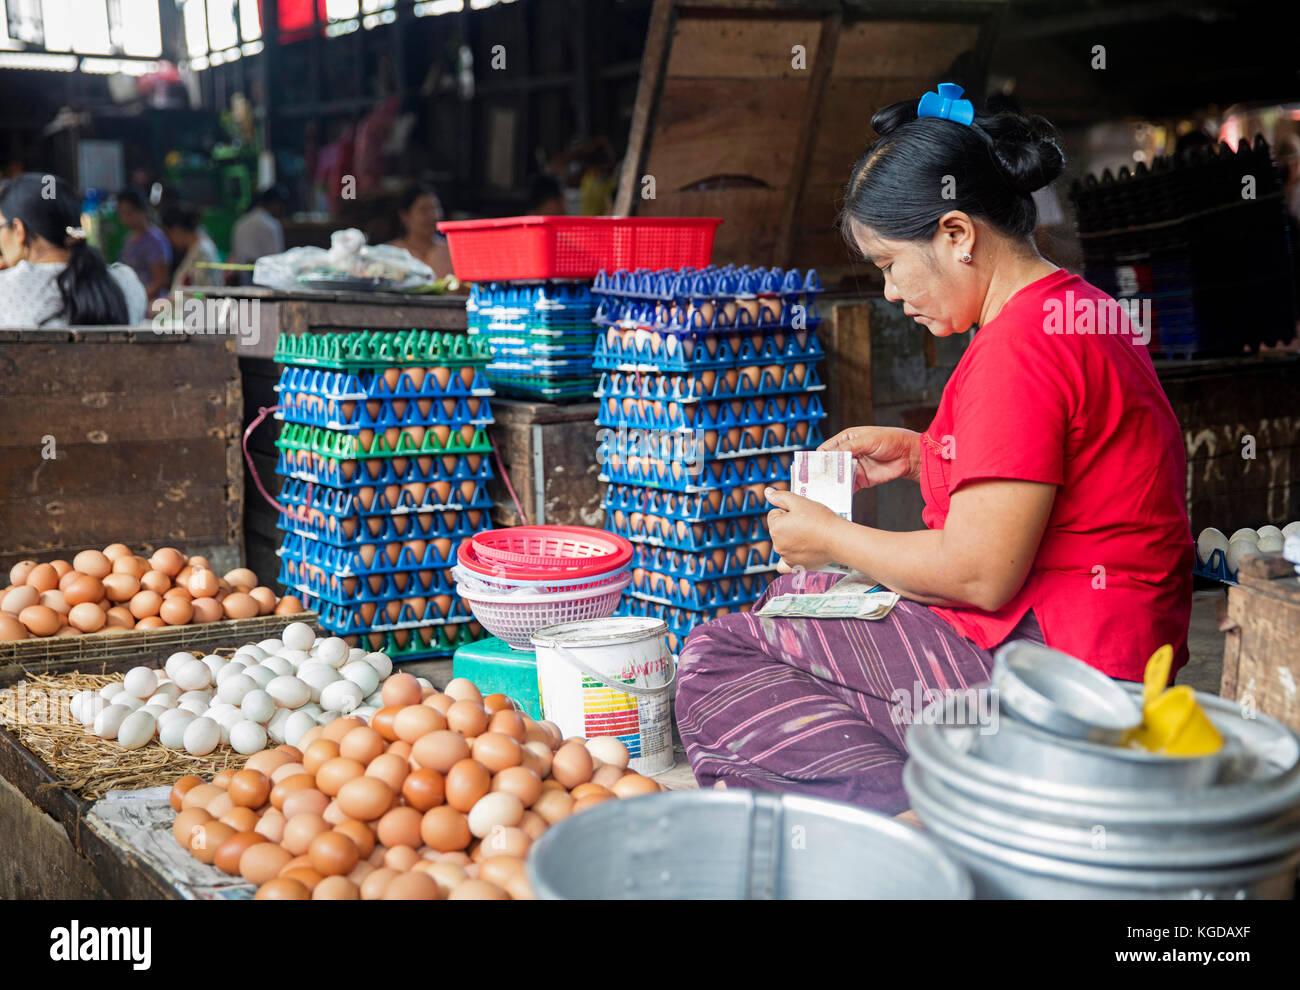 Burmese woman selling eggs and counting money at food market in Yangon / Rangoon, Myanmar / Burma - Stock Image